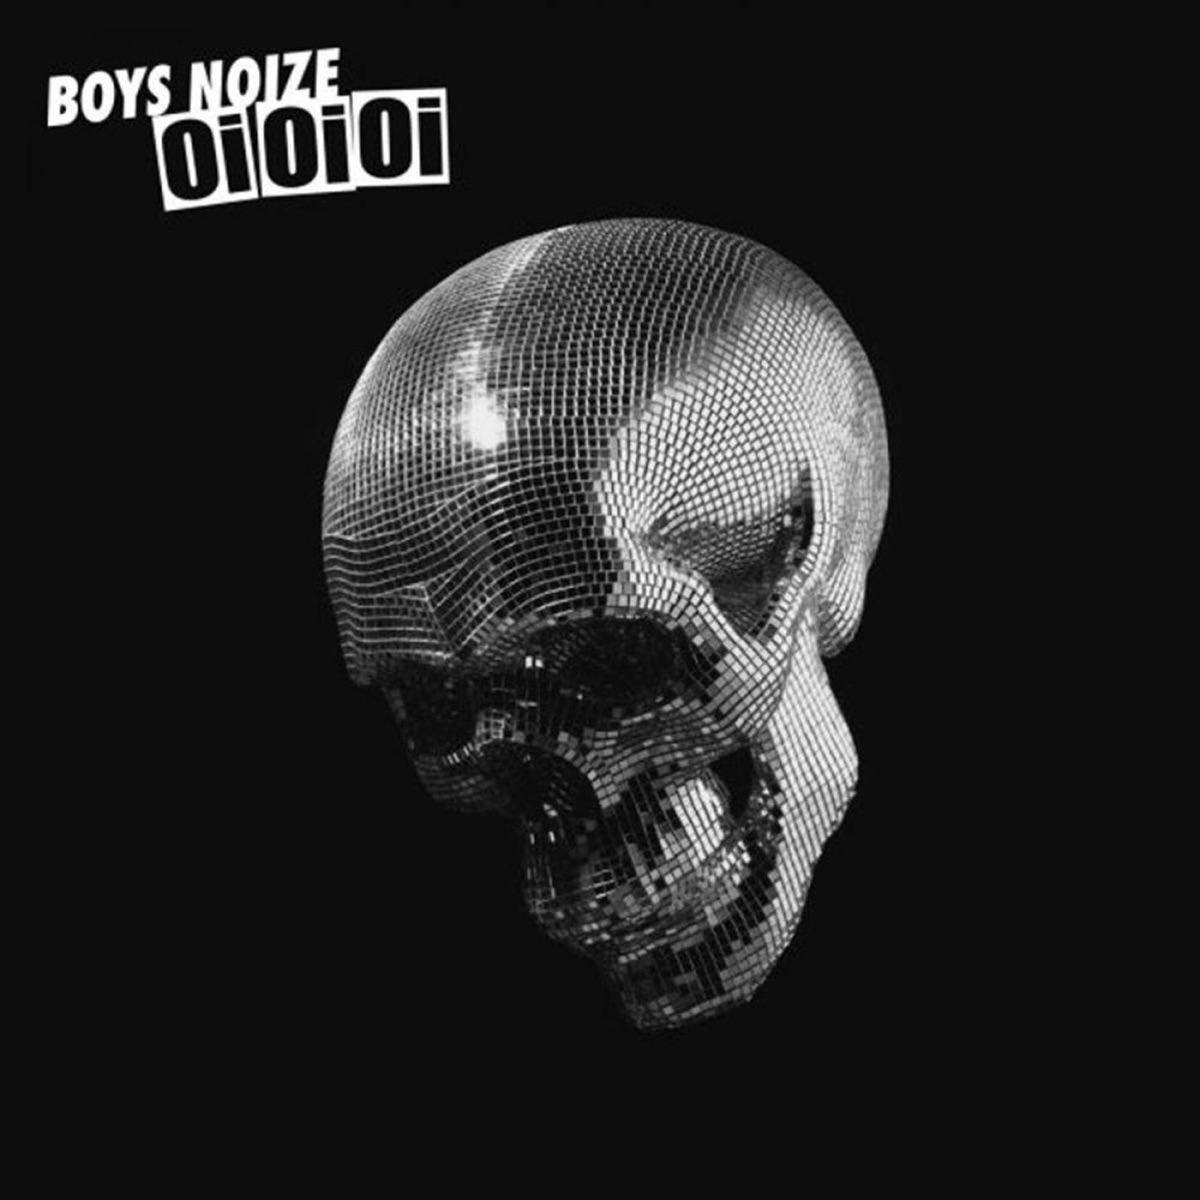 Oi Oi Oi Boys Noize CD cover